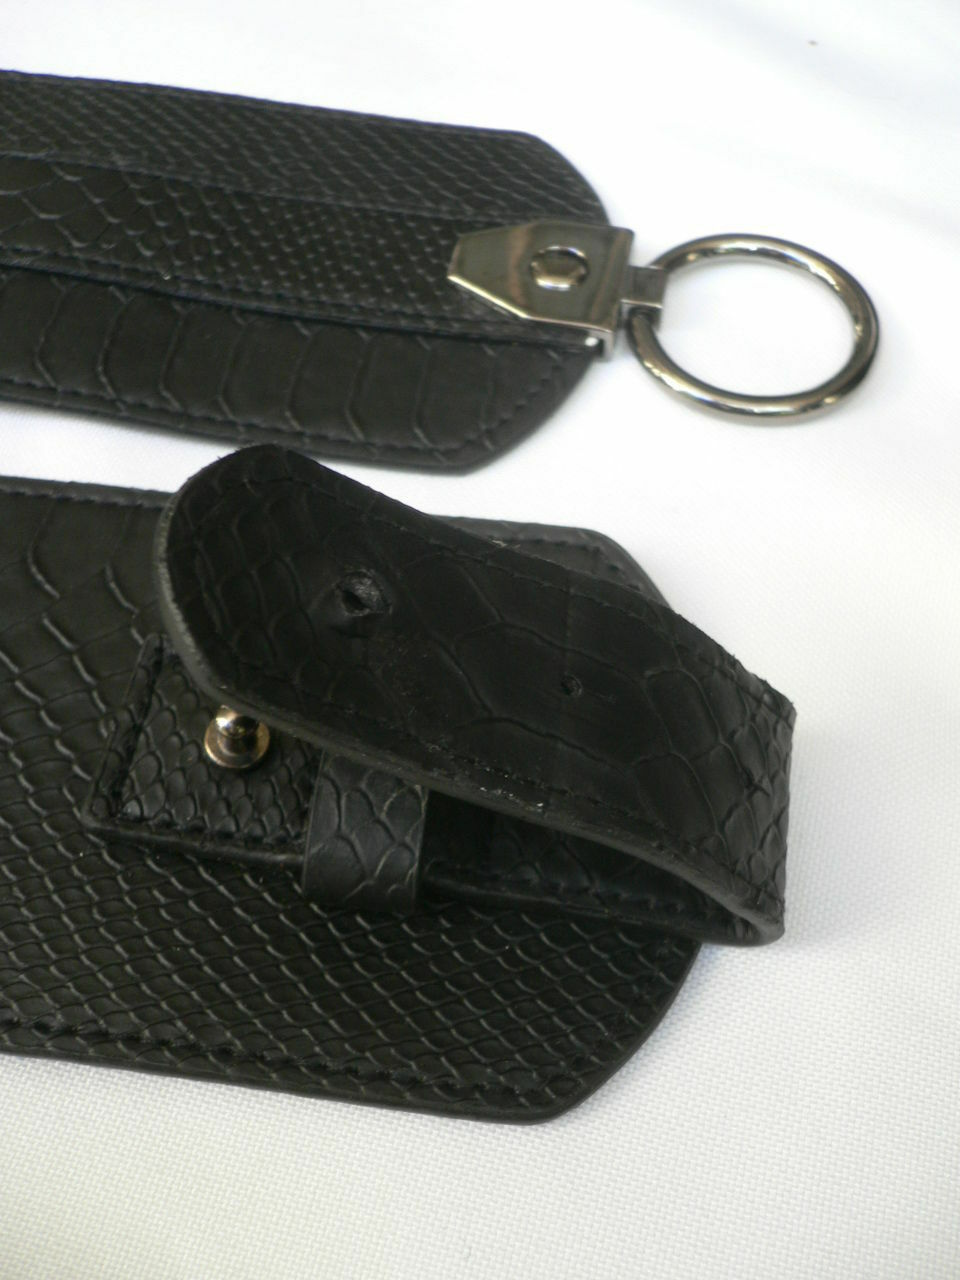 Cintura Donna Fashion Hip Vita Elastico Nero Largo Finta pelle Serpente Timbro image 7